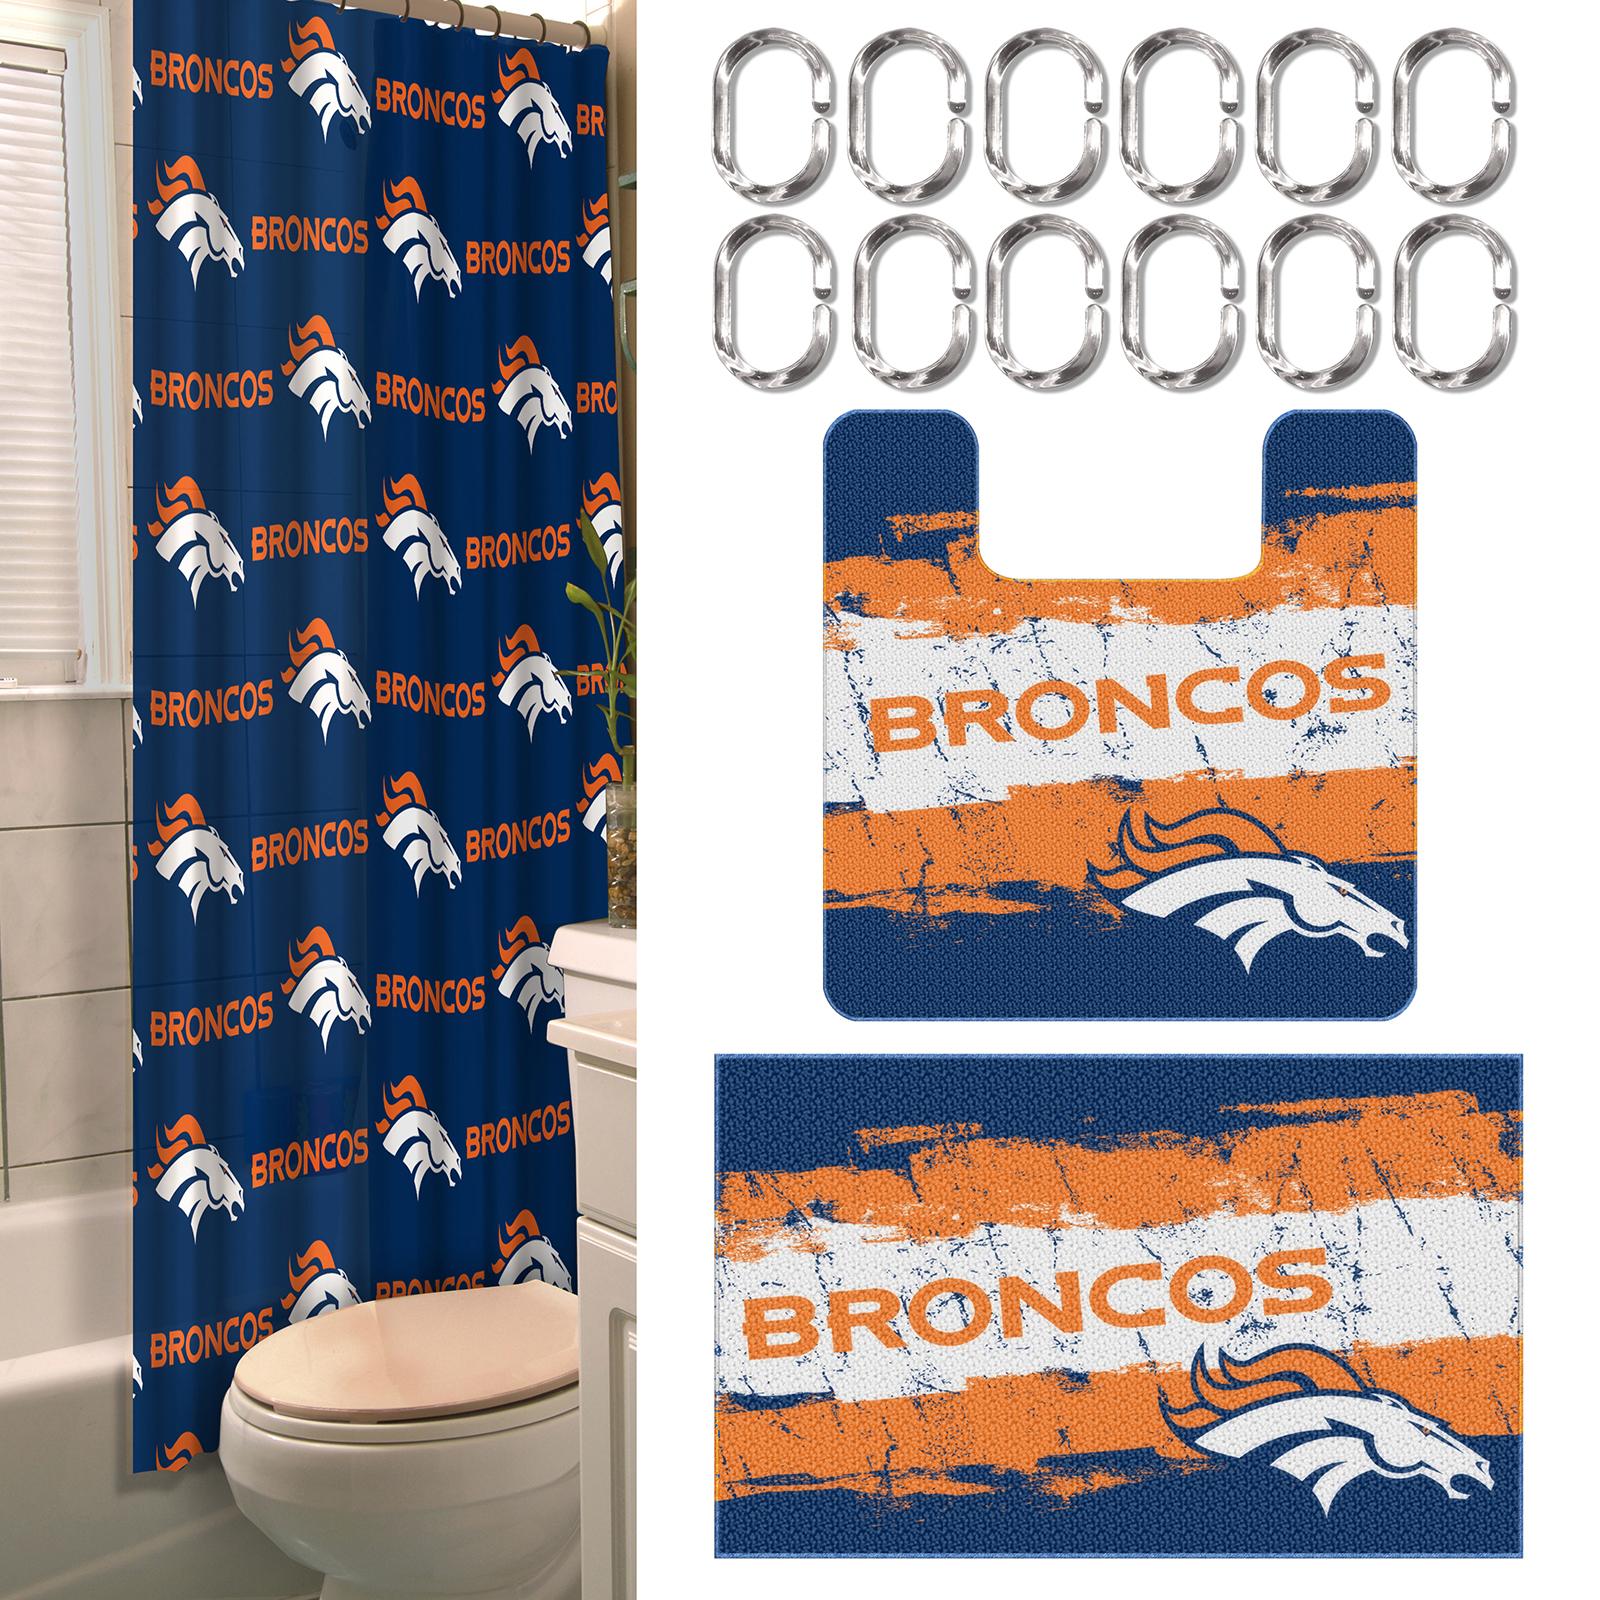 Chicago bears bathroom accessories - Nfl Denver Broncos Bathroom Set Fitness Sports Fan Shop Nfl Shop Denver Broncos Denver Broncos Bedding Bath